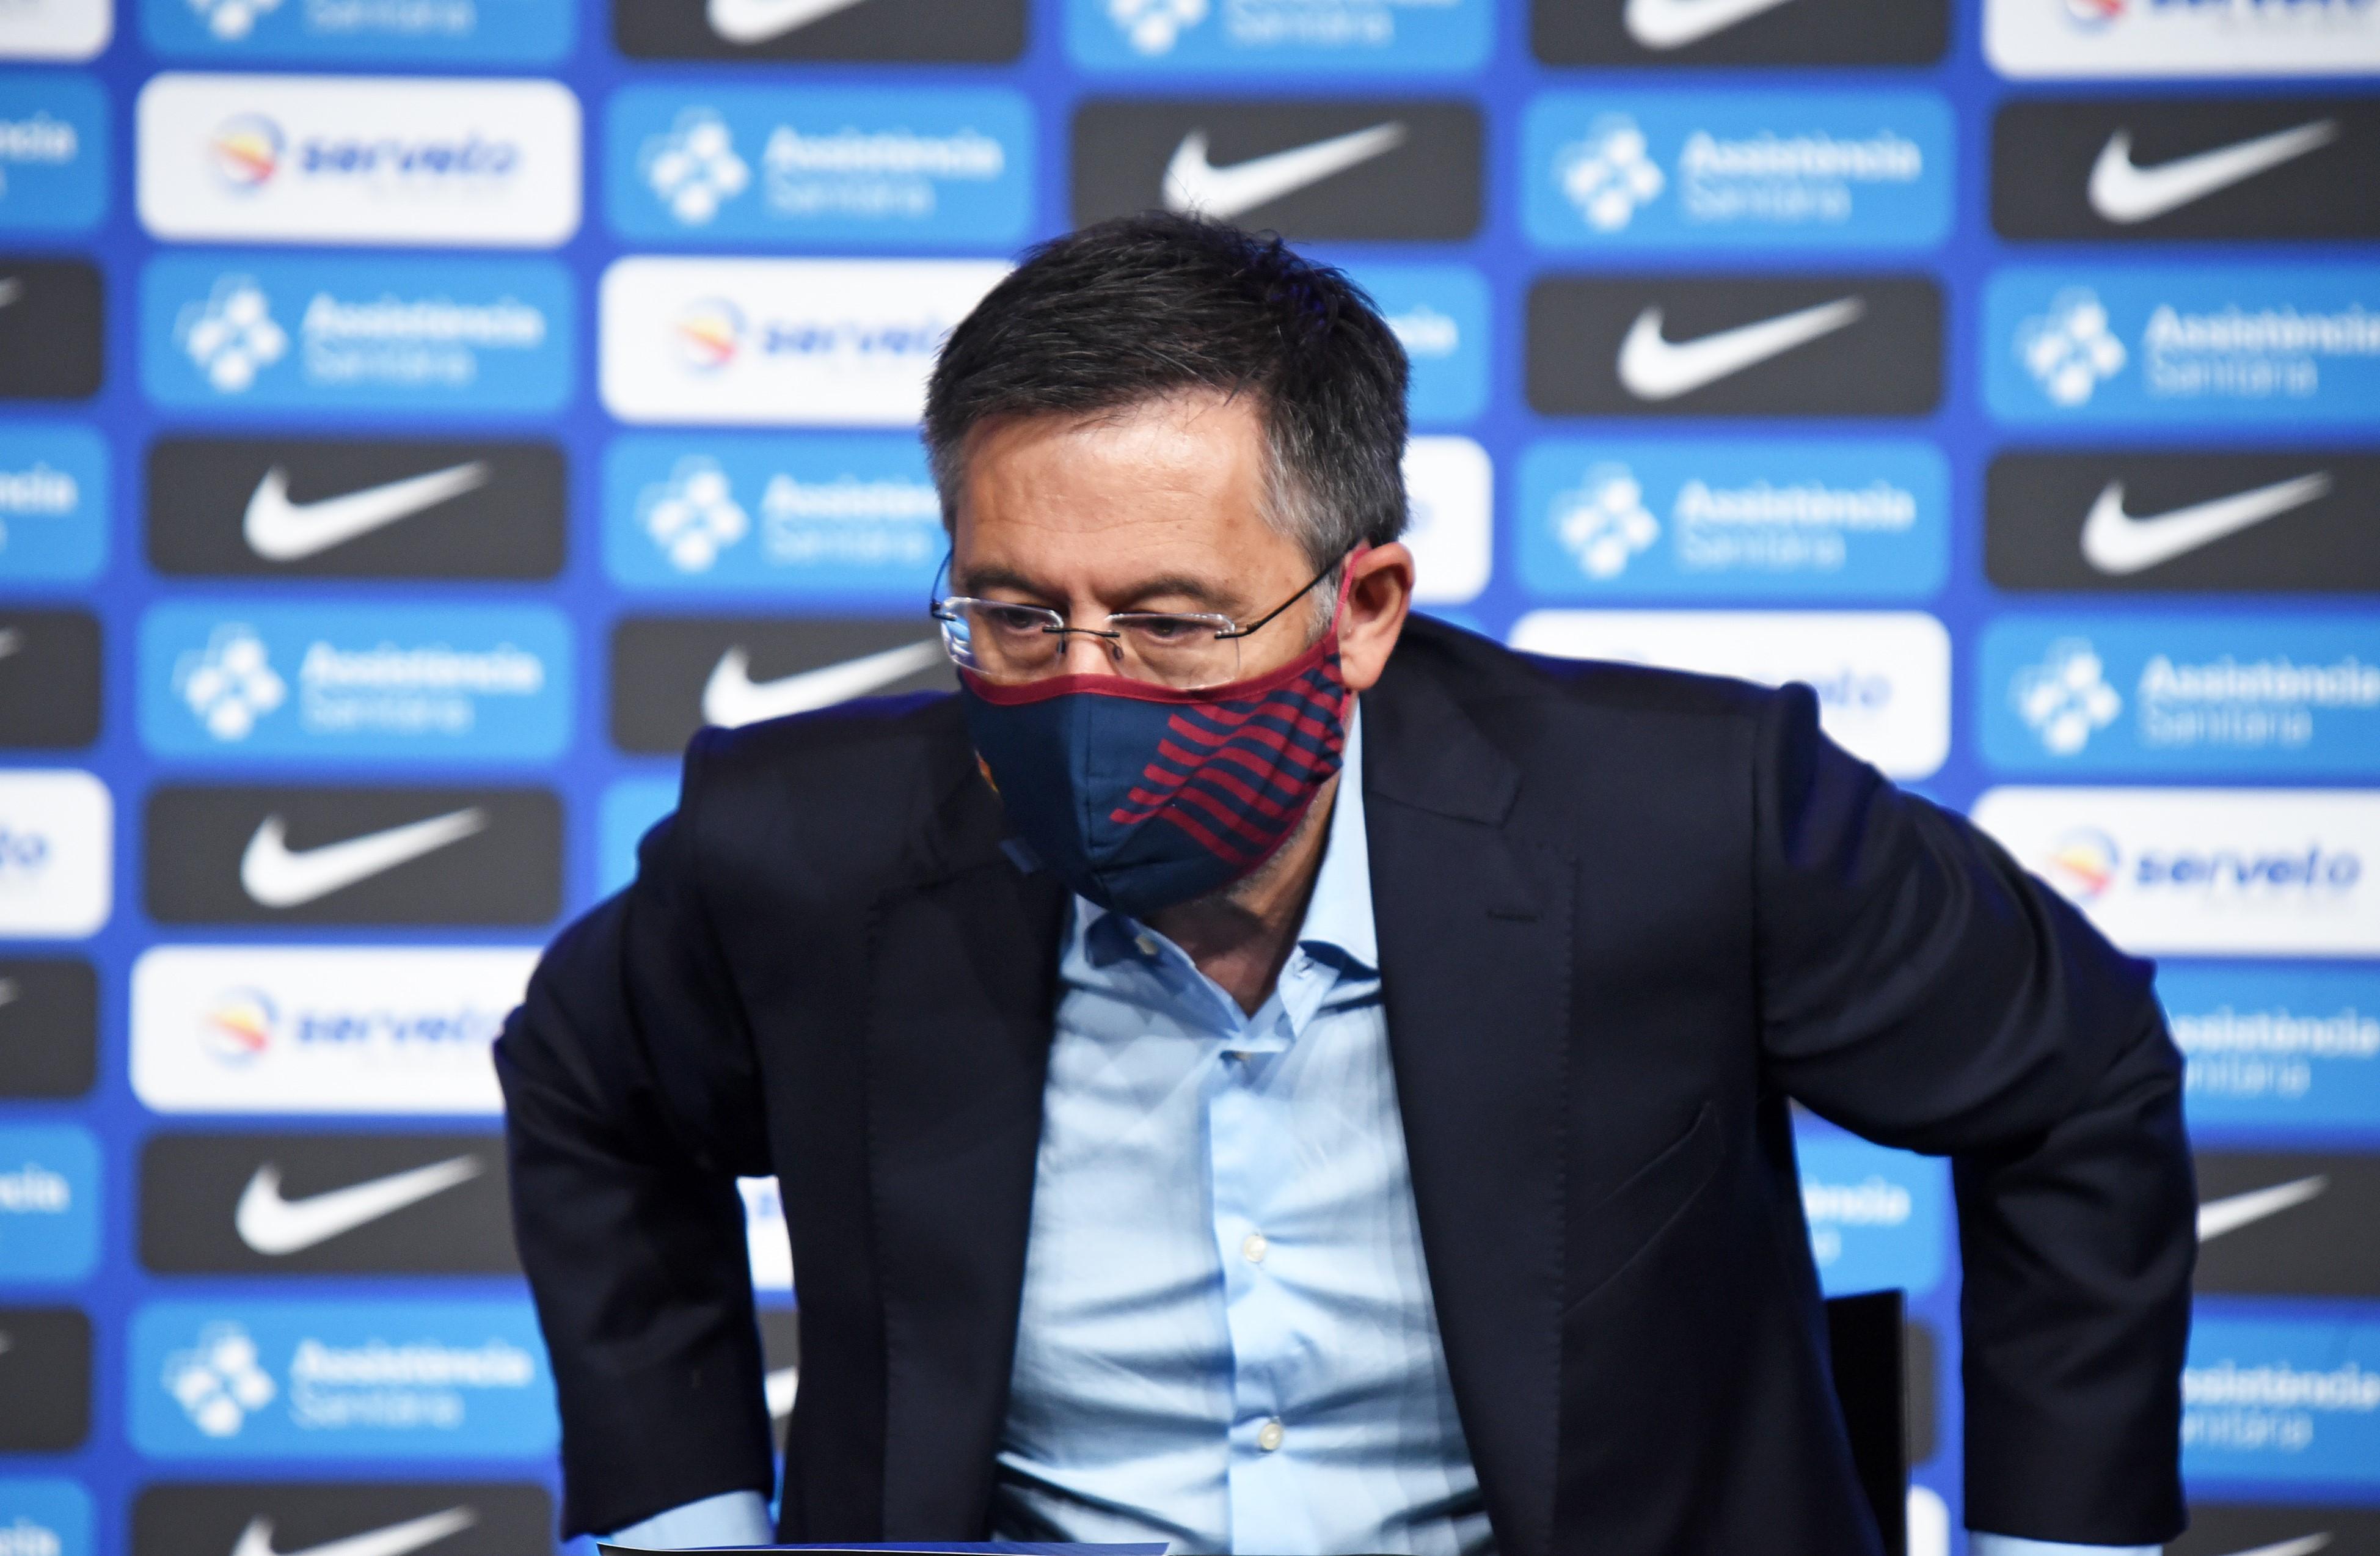 https://i.eurosport.com/2020/08/27/2872857.jpg